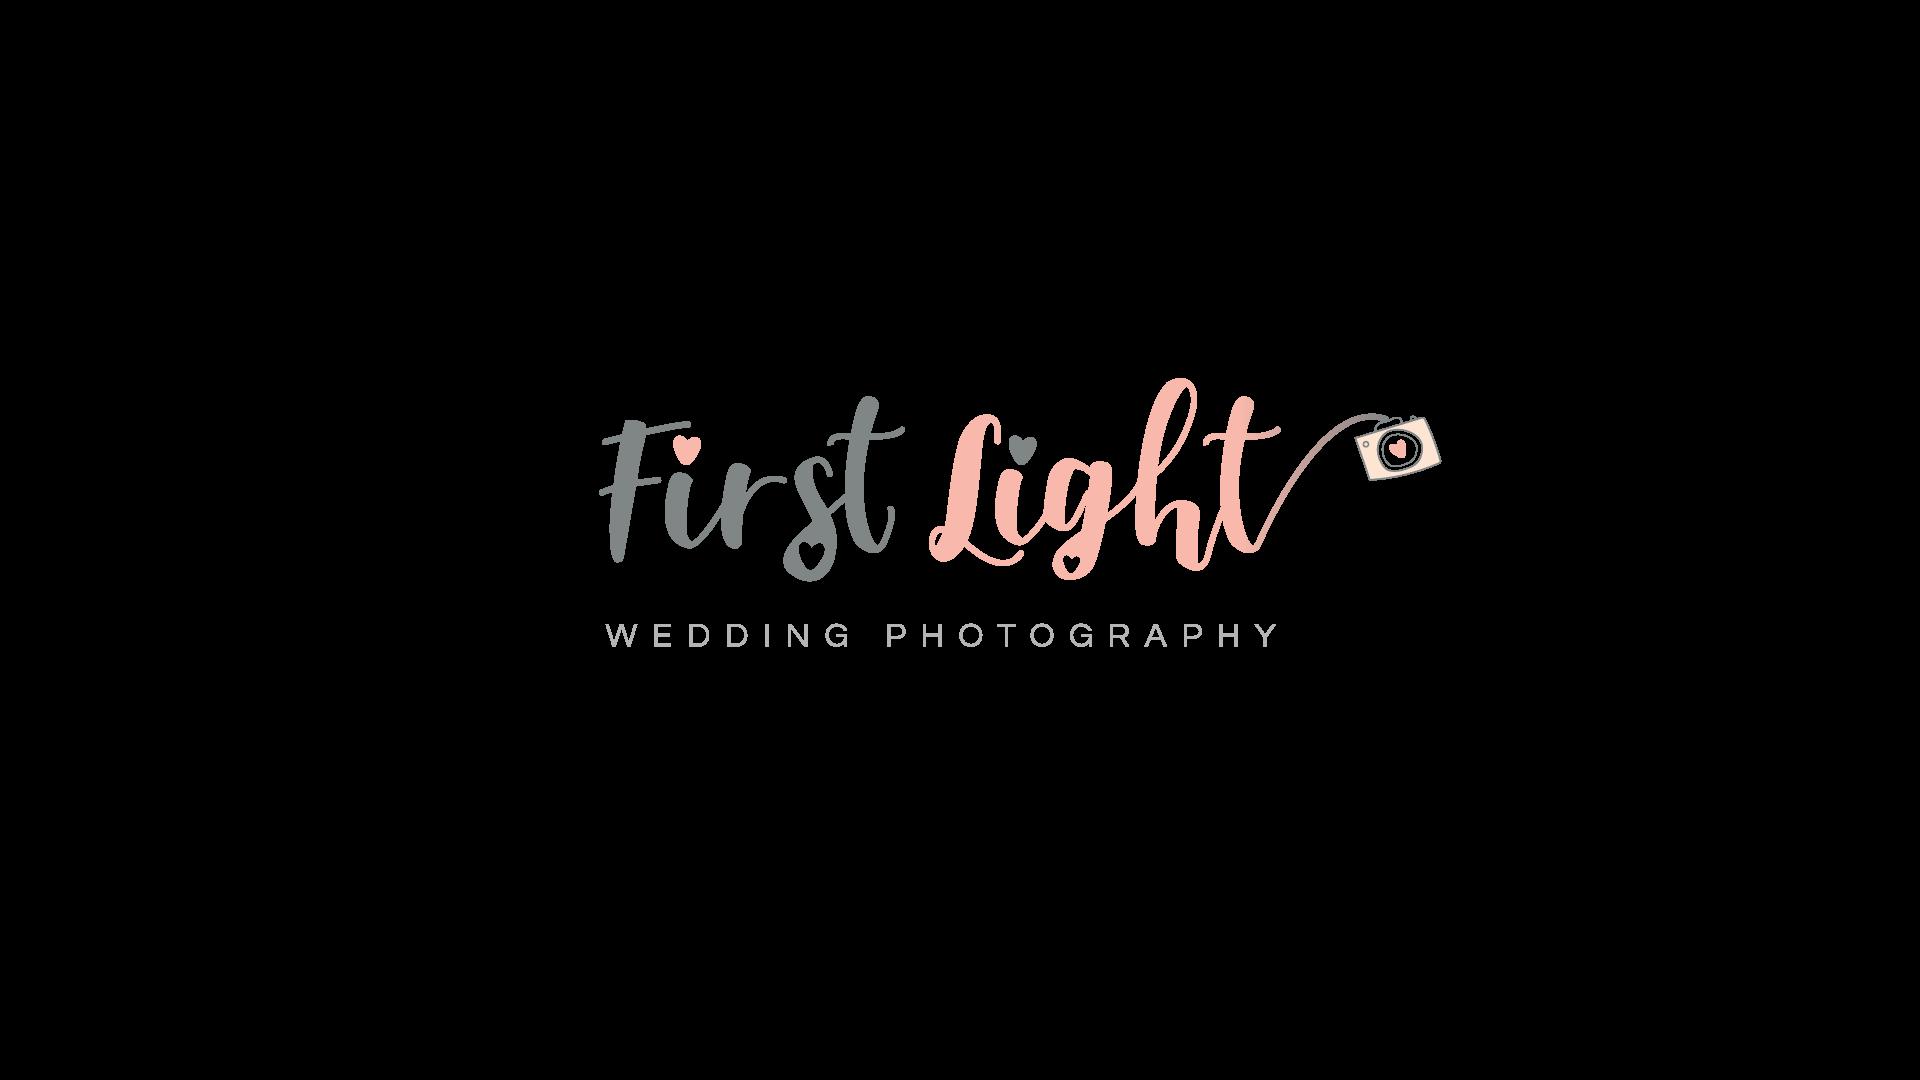 First Light Wedding Photography